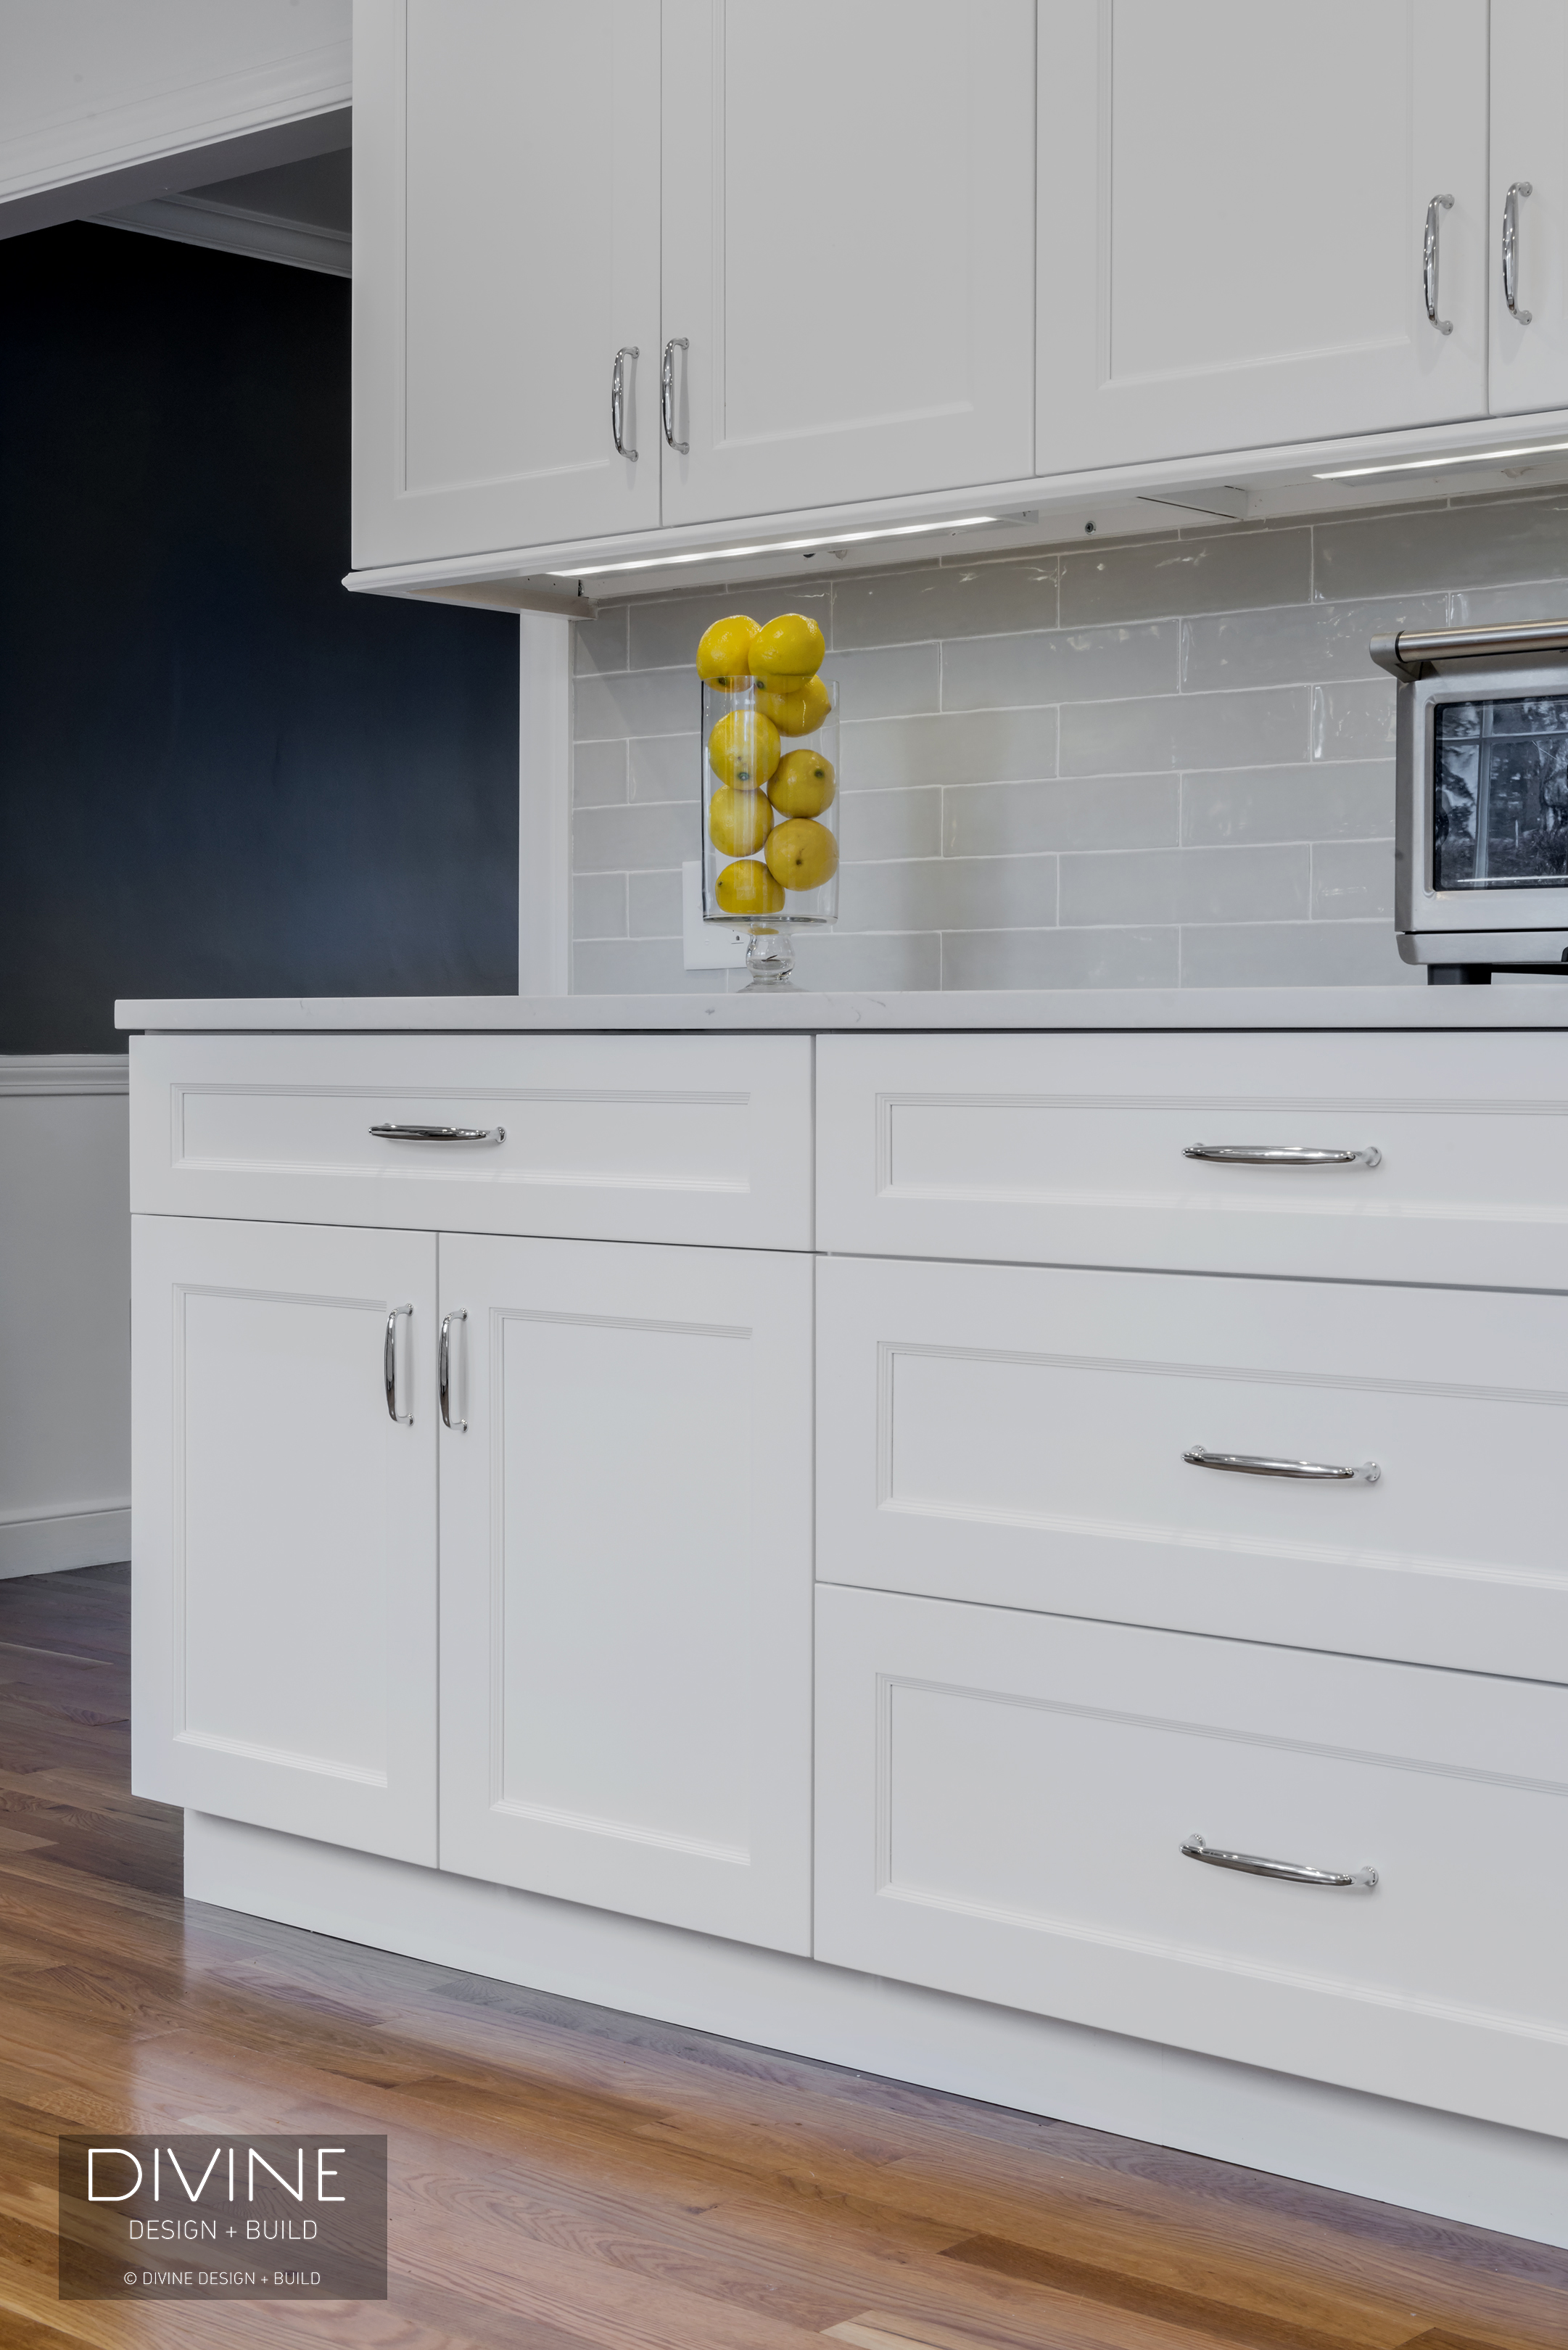 8 Pictures Of Kitchens With Subway Tile Backsplashes Divine Design